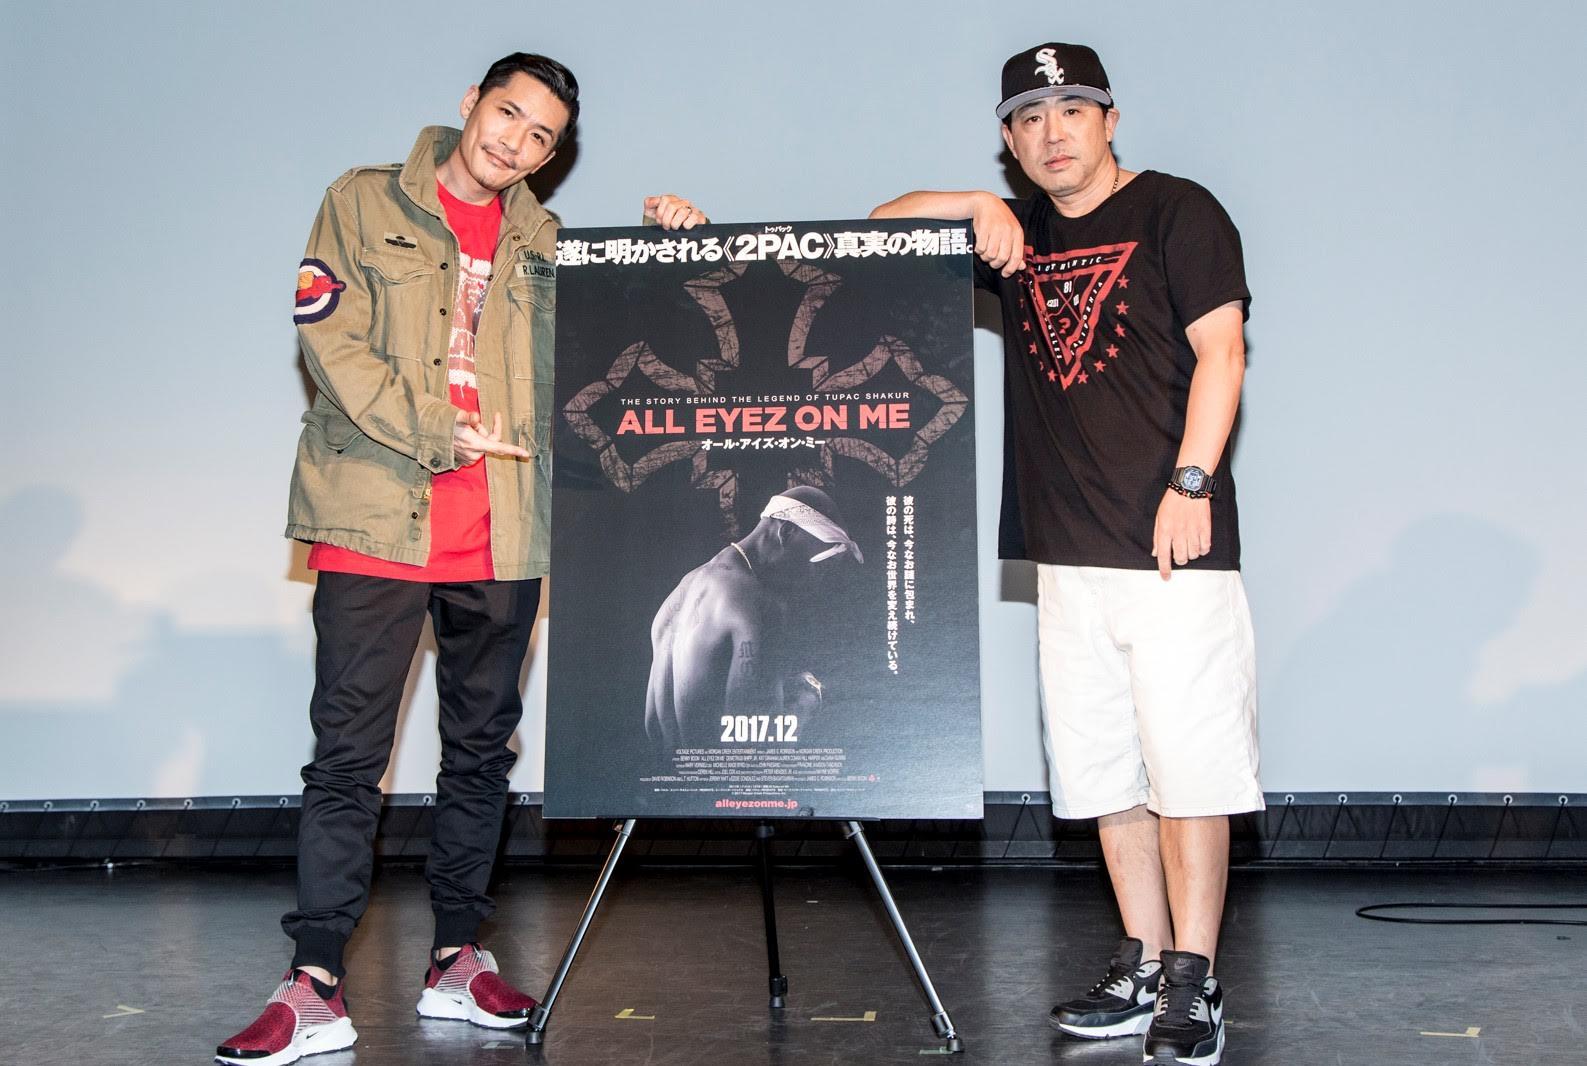 KダブシャインとZeebraが2Pacについて独自の目線で語る。伝記映画「All Eyez On Me」公開決定記念インタビュー!